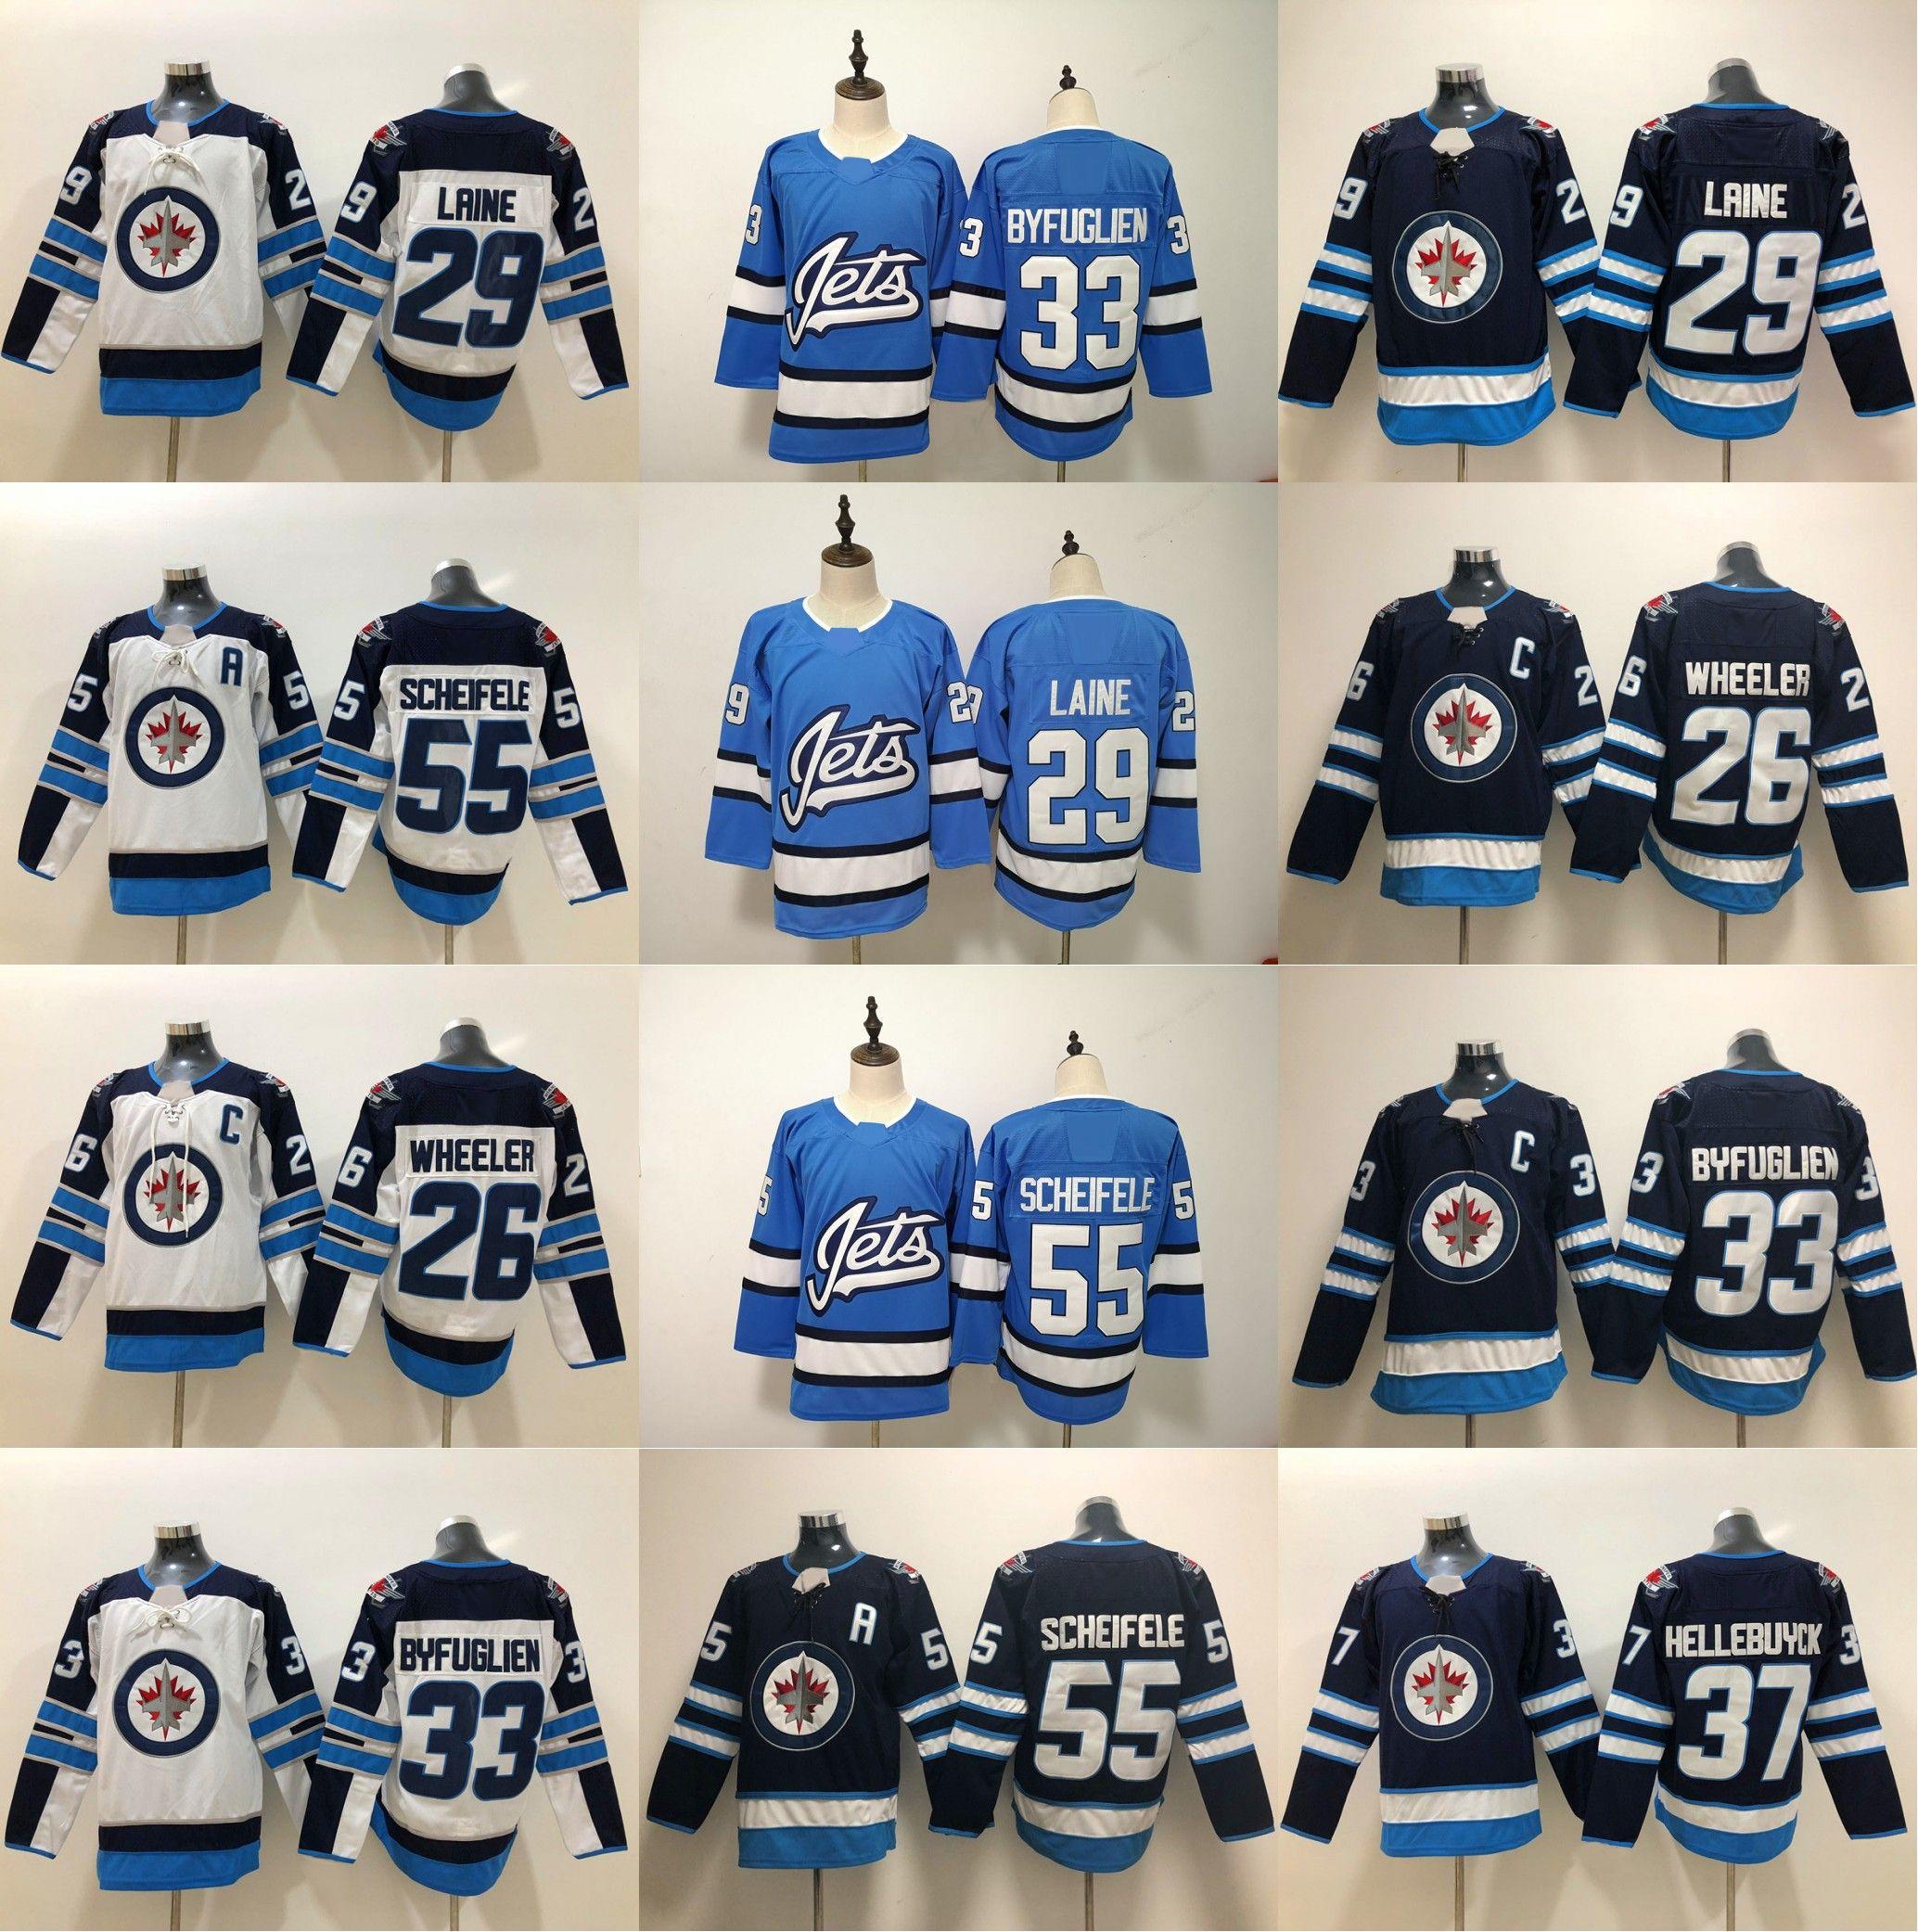 the latest 66f7d 921e8 2018-19 New Winnipeg Jets Jerseys 37 Connor Hellebuyck 29 Patrik Laine 33  Dustin 55 Mark Scheifele 26 Blake Wheeler Hockey Jerseys